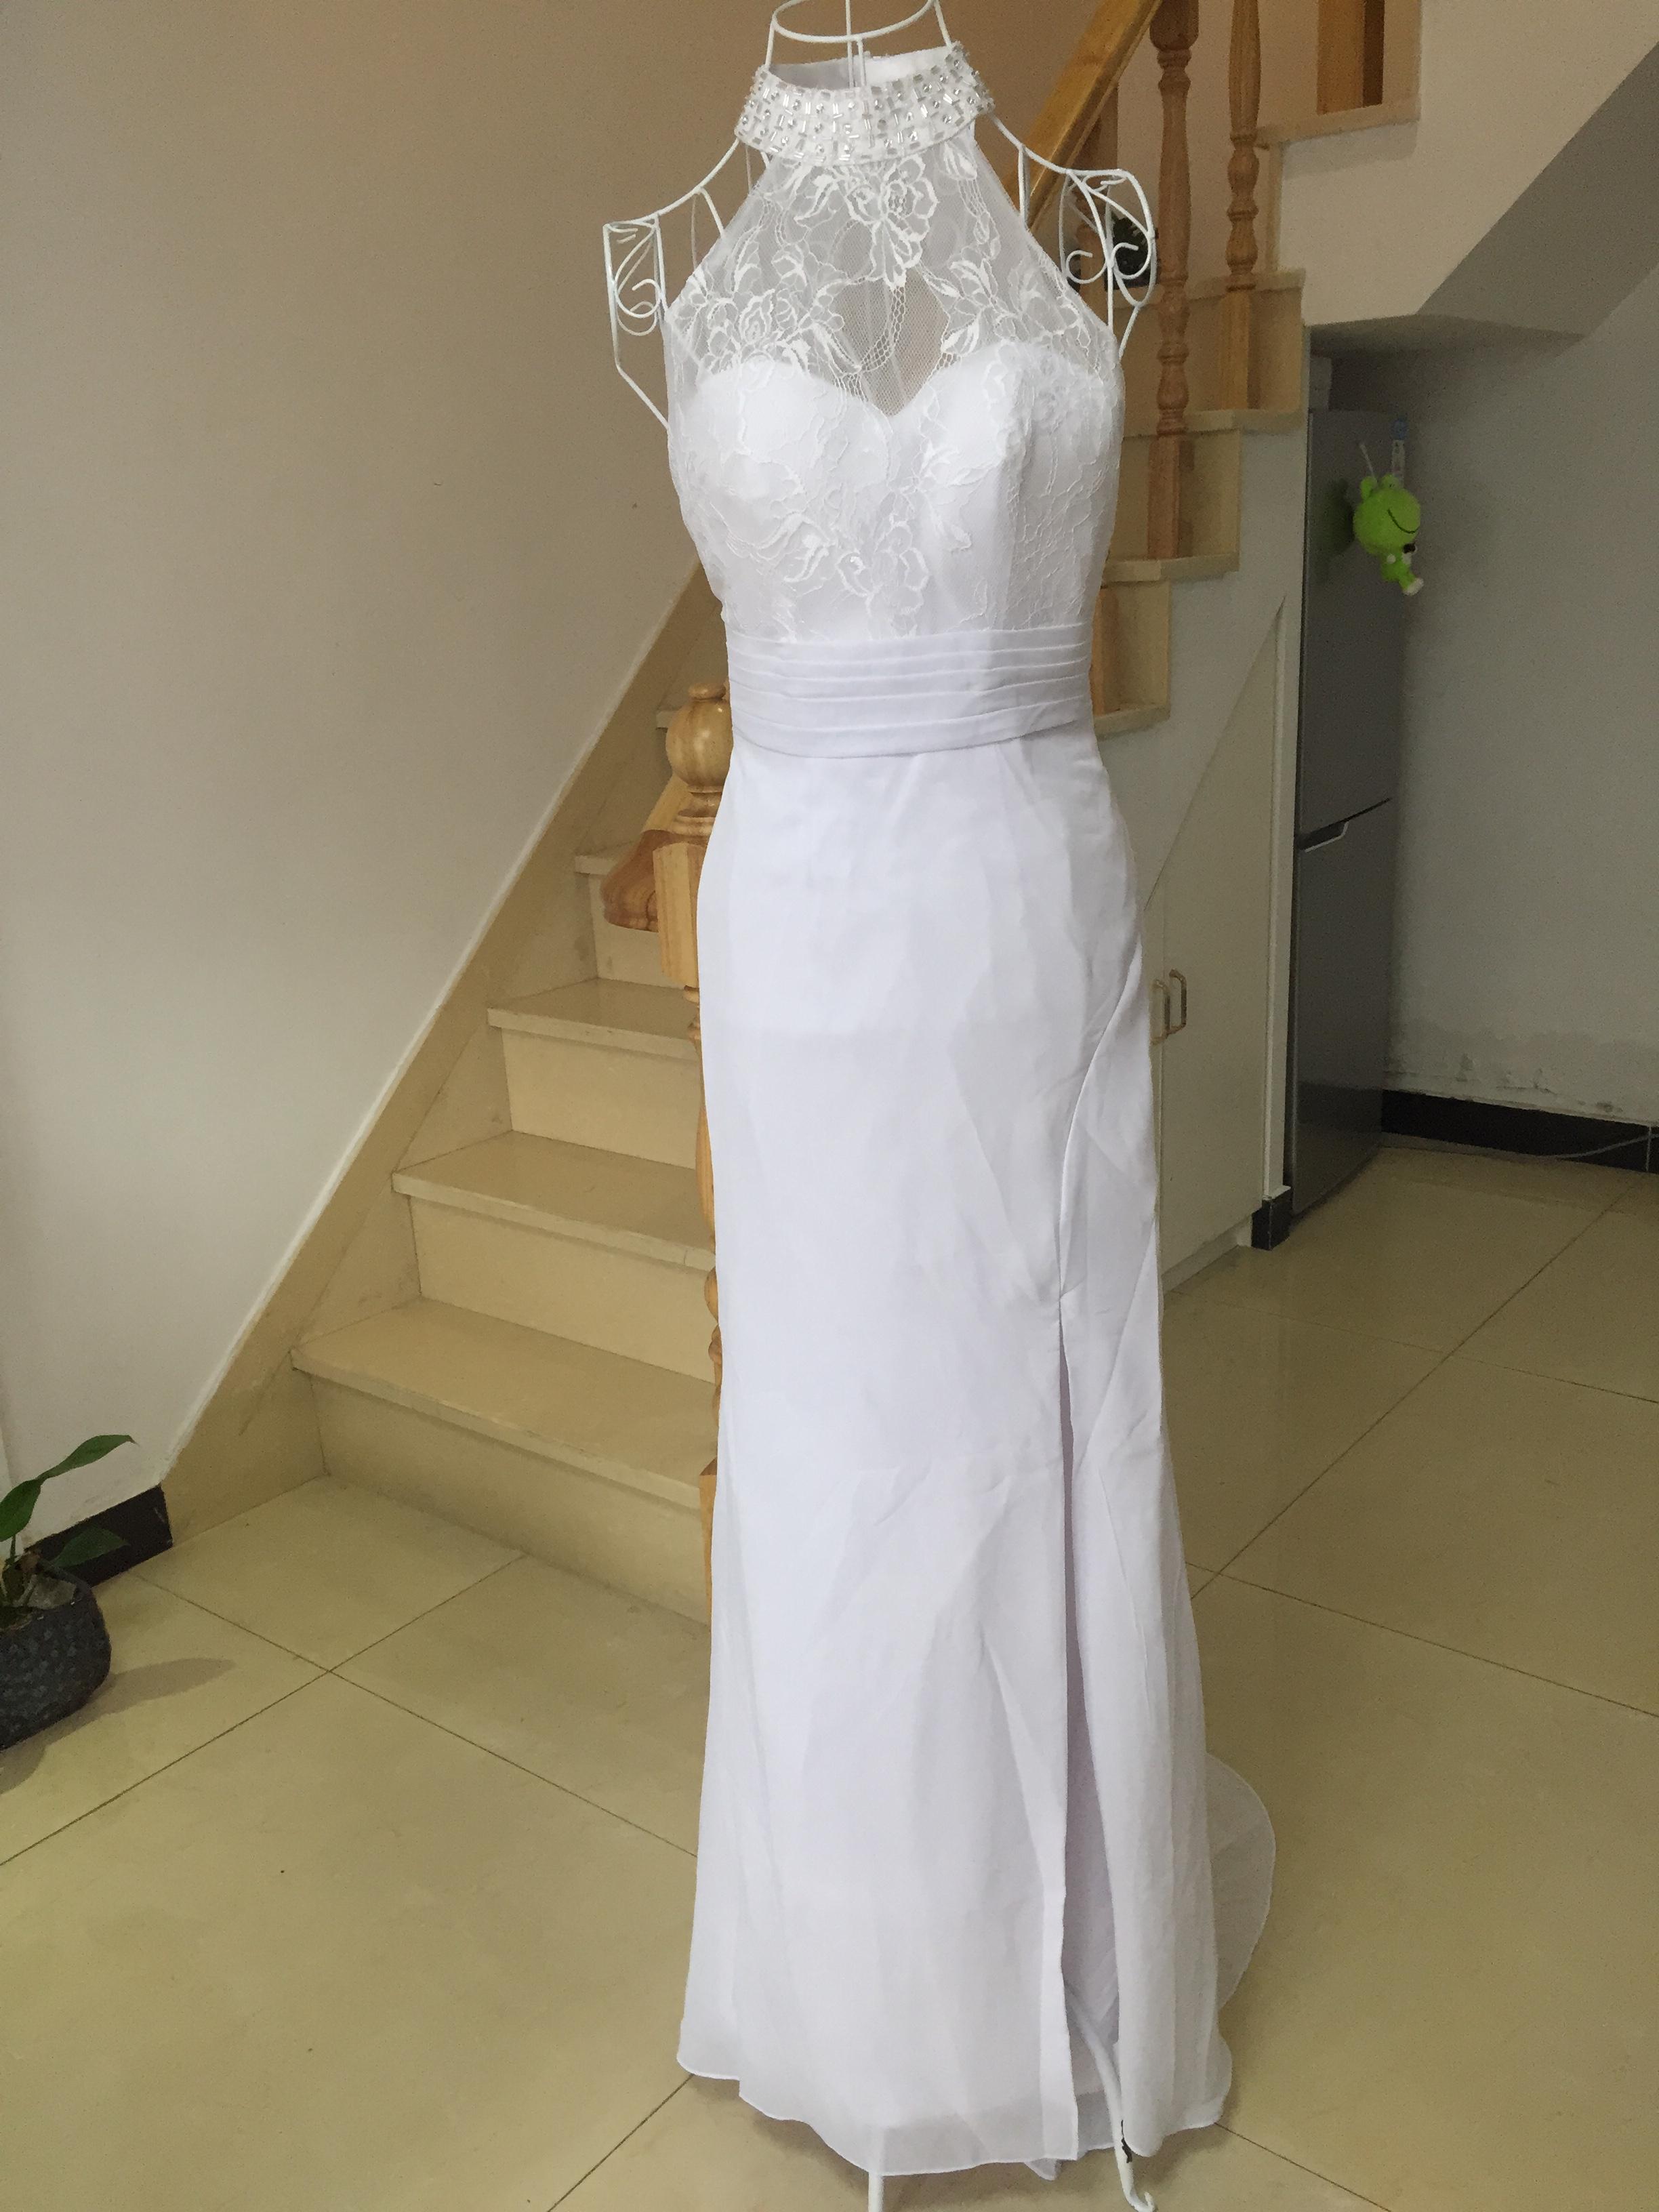 A399 Real Made Lace Top Wedding Dresses, Halter Side Slit Wedding ...